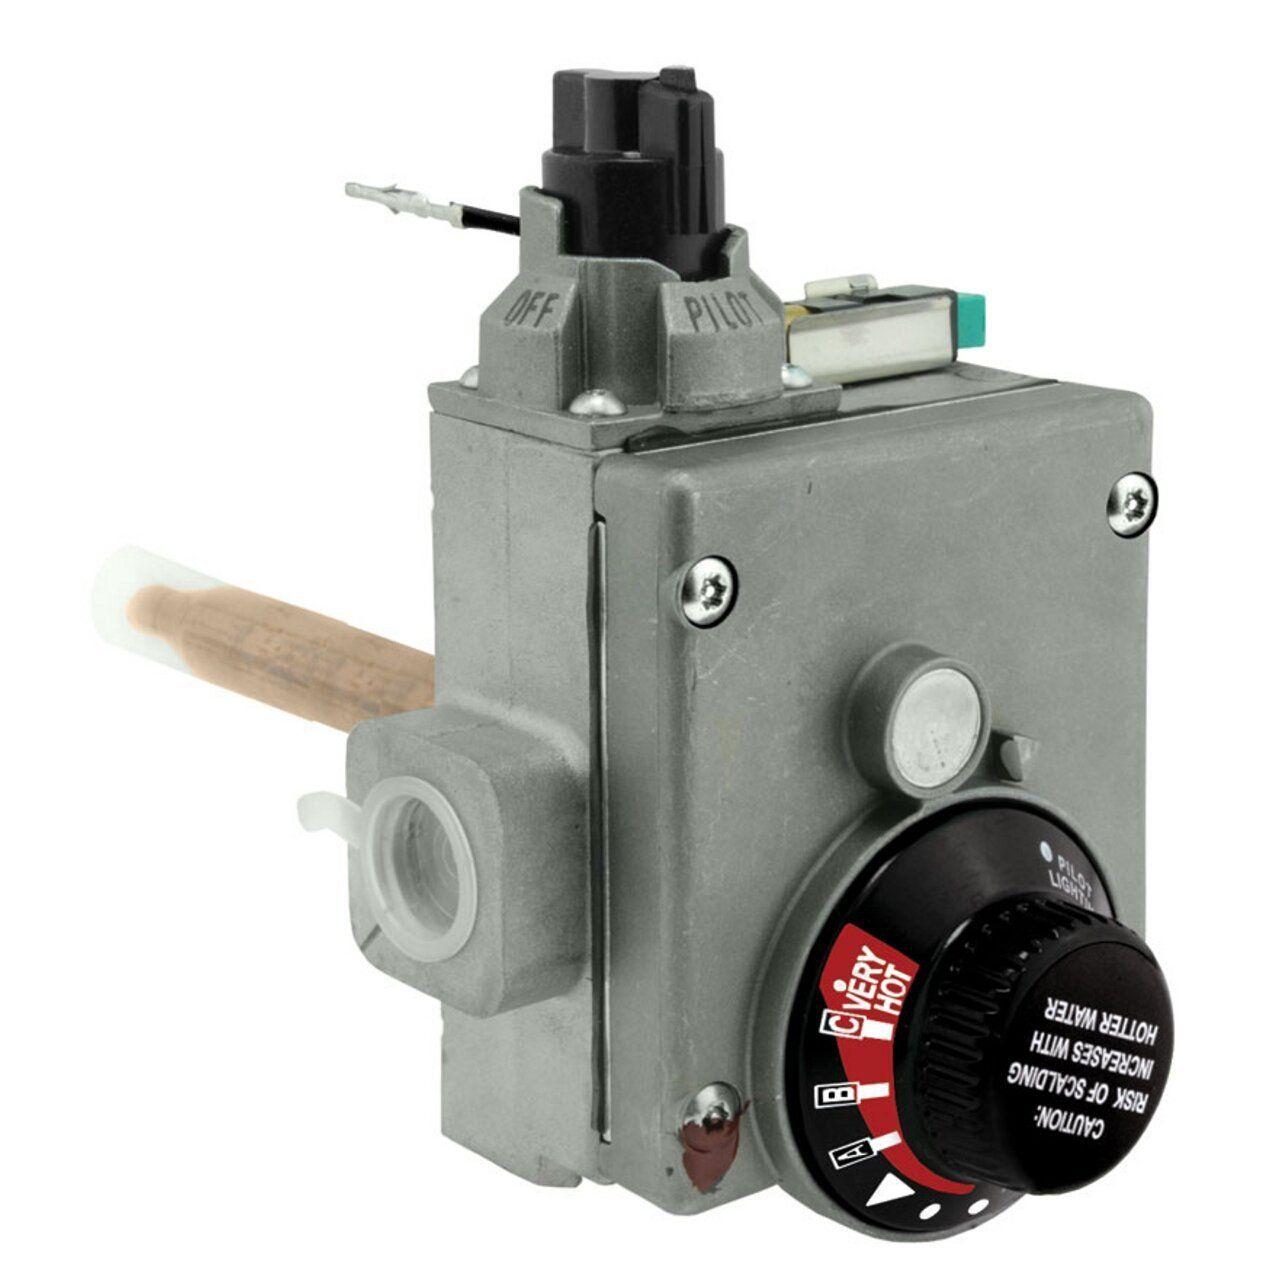 Sp14270g Gas Valve Natural Gas Thermostat White Rodgers Rheem Katia Home Appliances Sale Control Valves